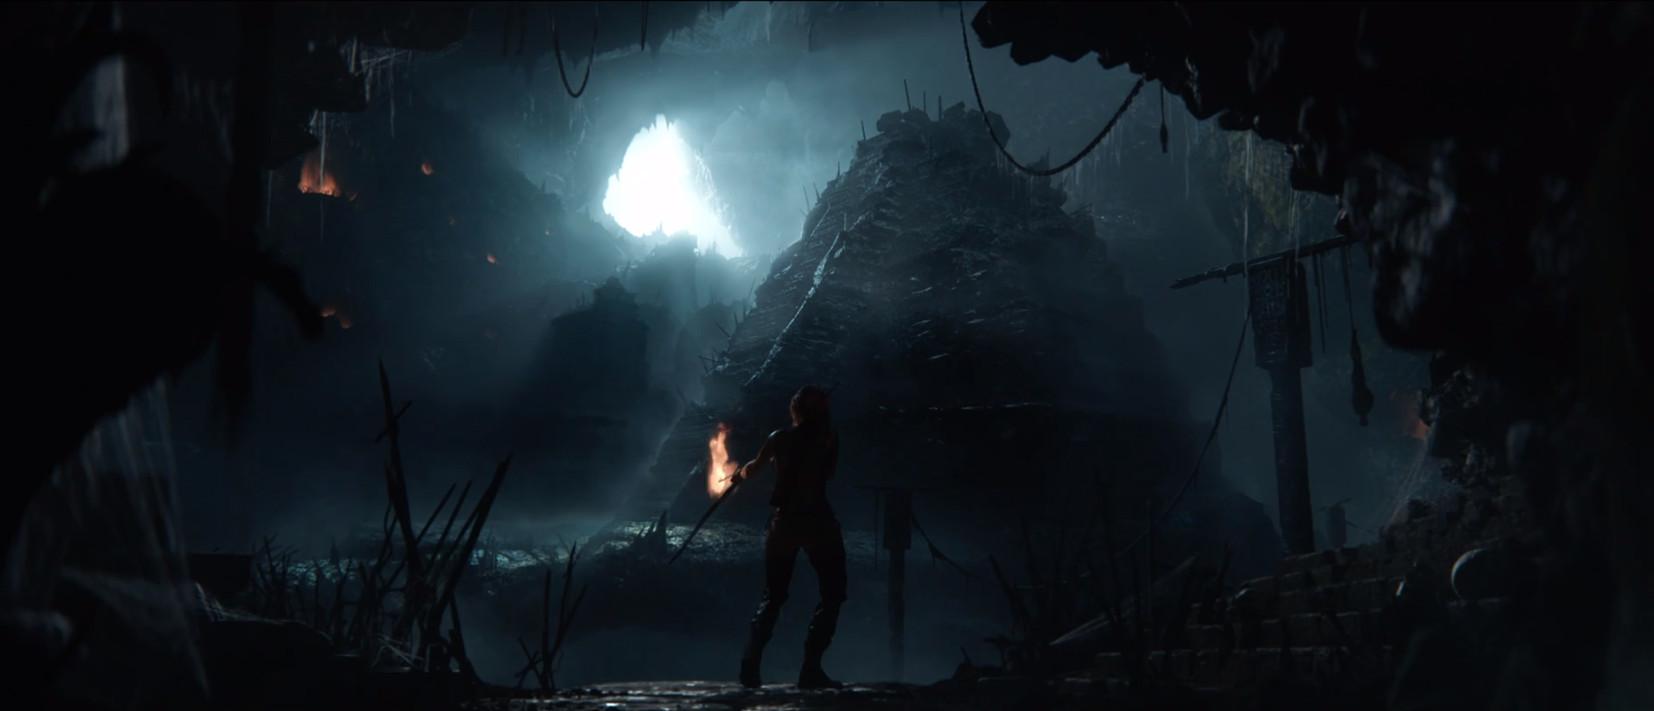 shadow-tomb-raider-end-of-beginning-trailer42